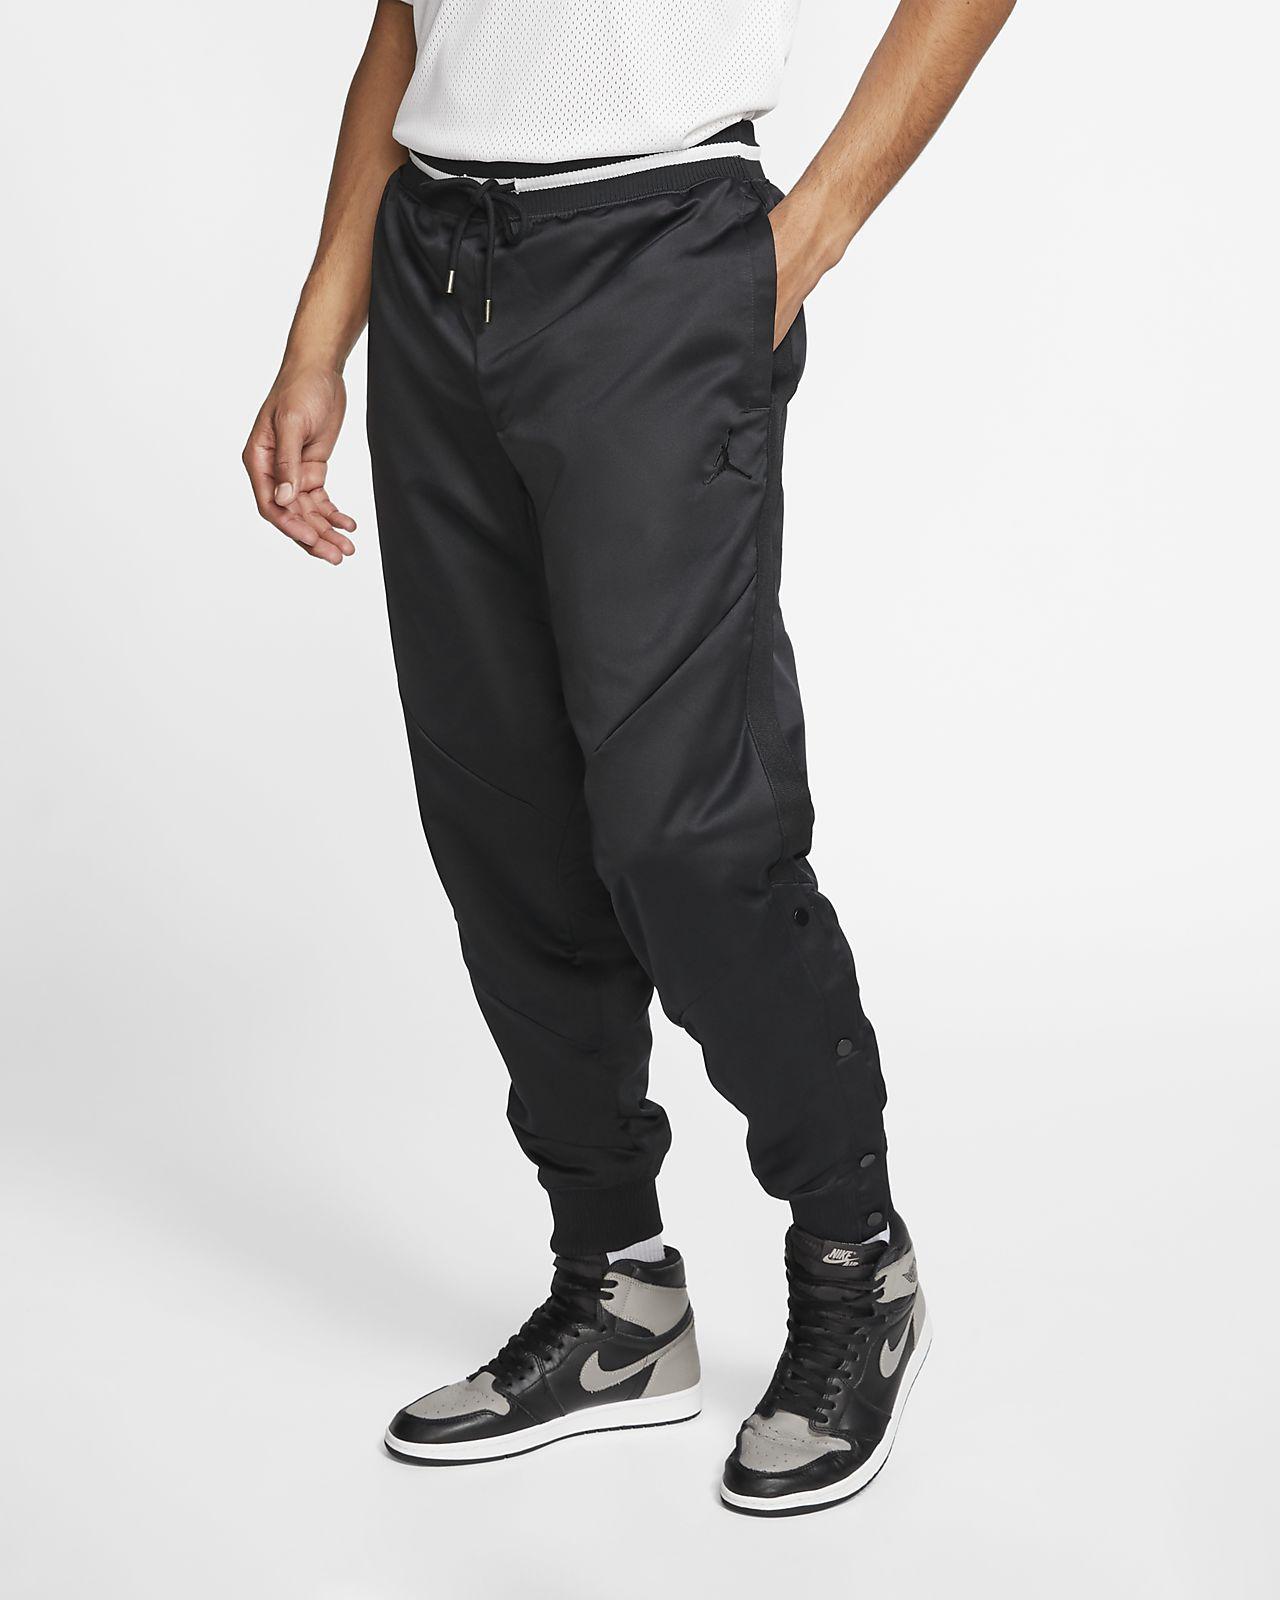 Jordan DNA Pantalons separables - Home